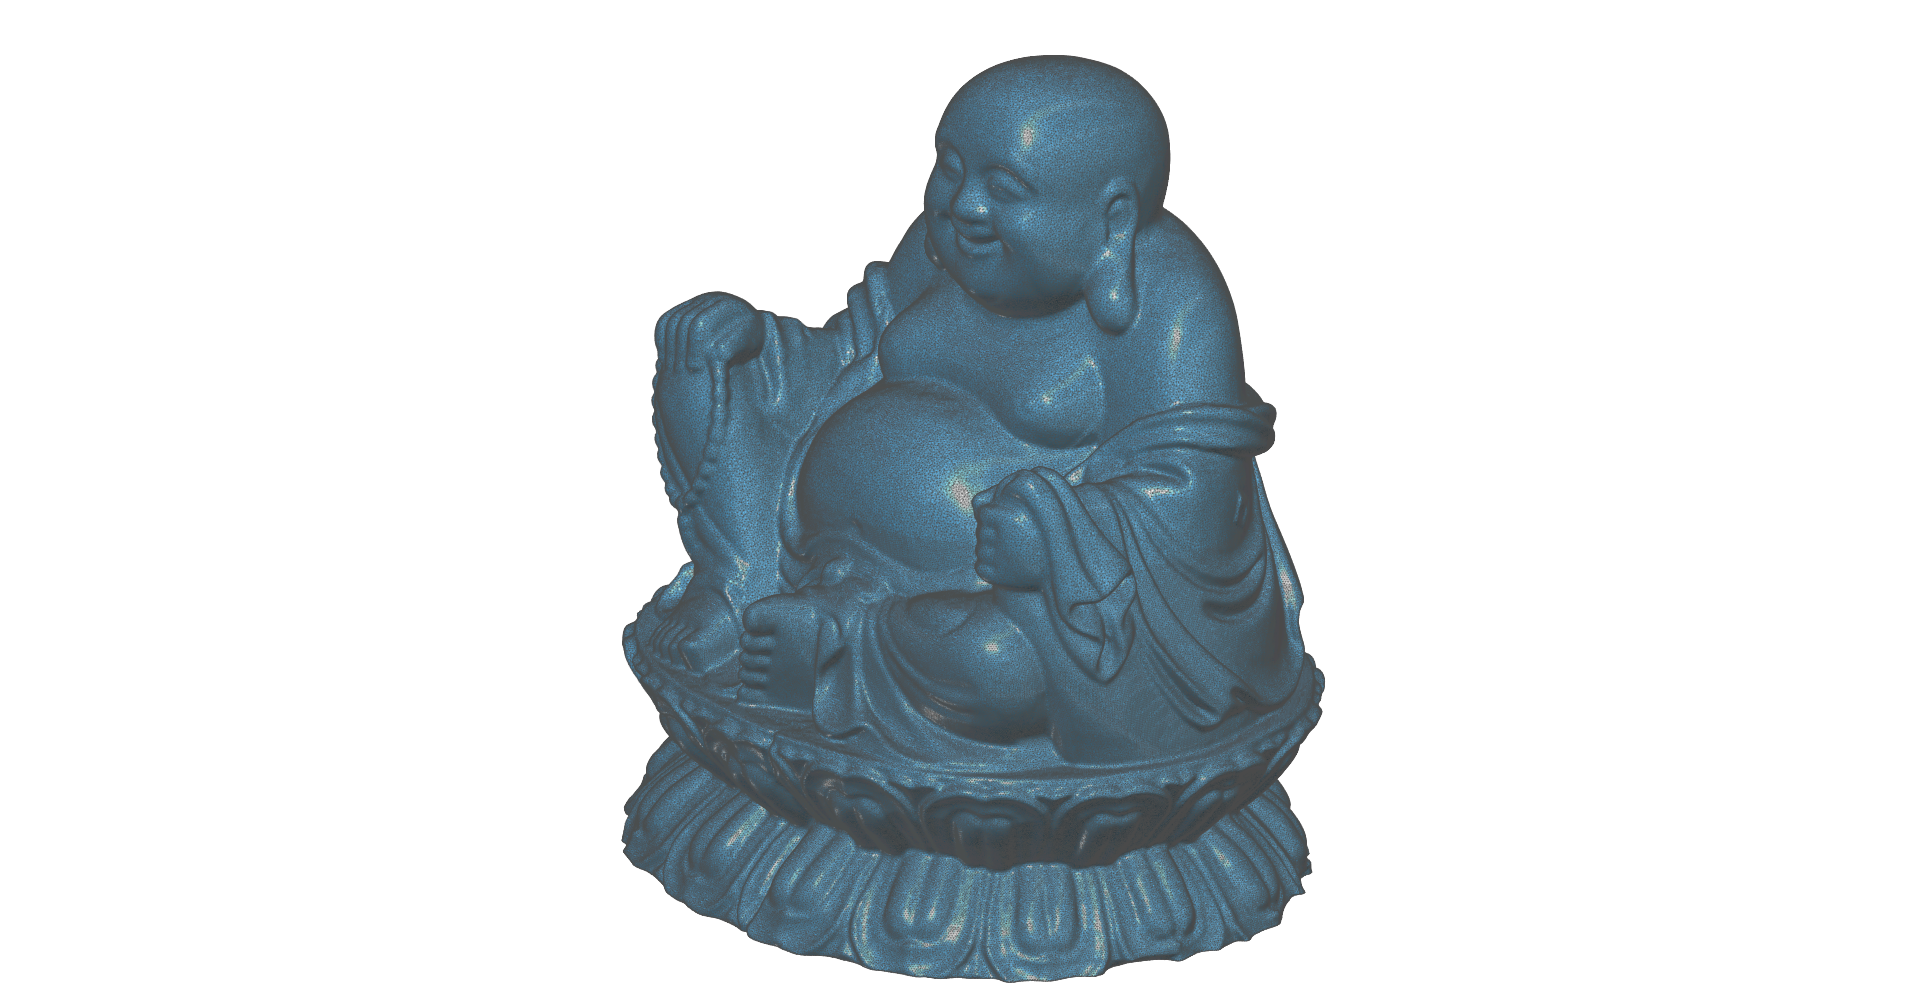 Buddha3.png Download free STL file Buddha • Model to 3D print, Icenvain